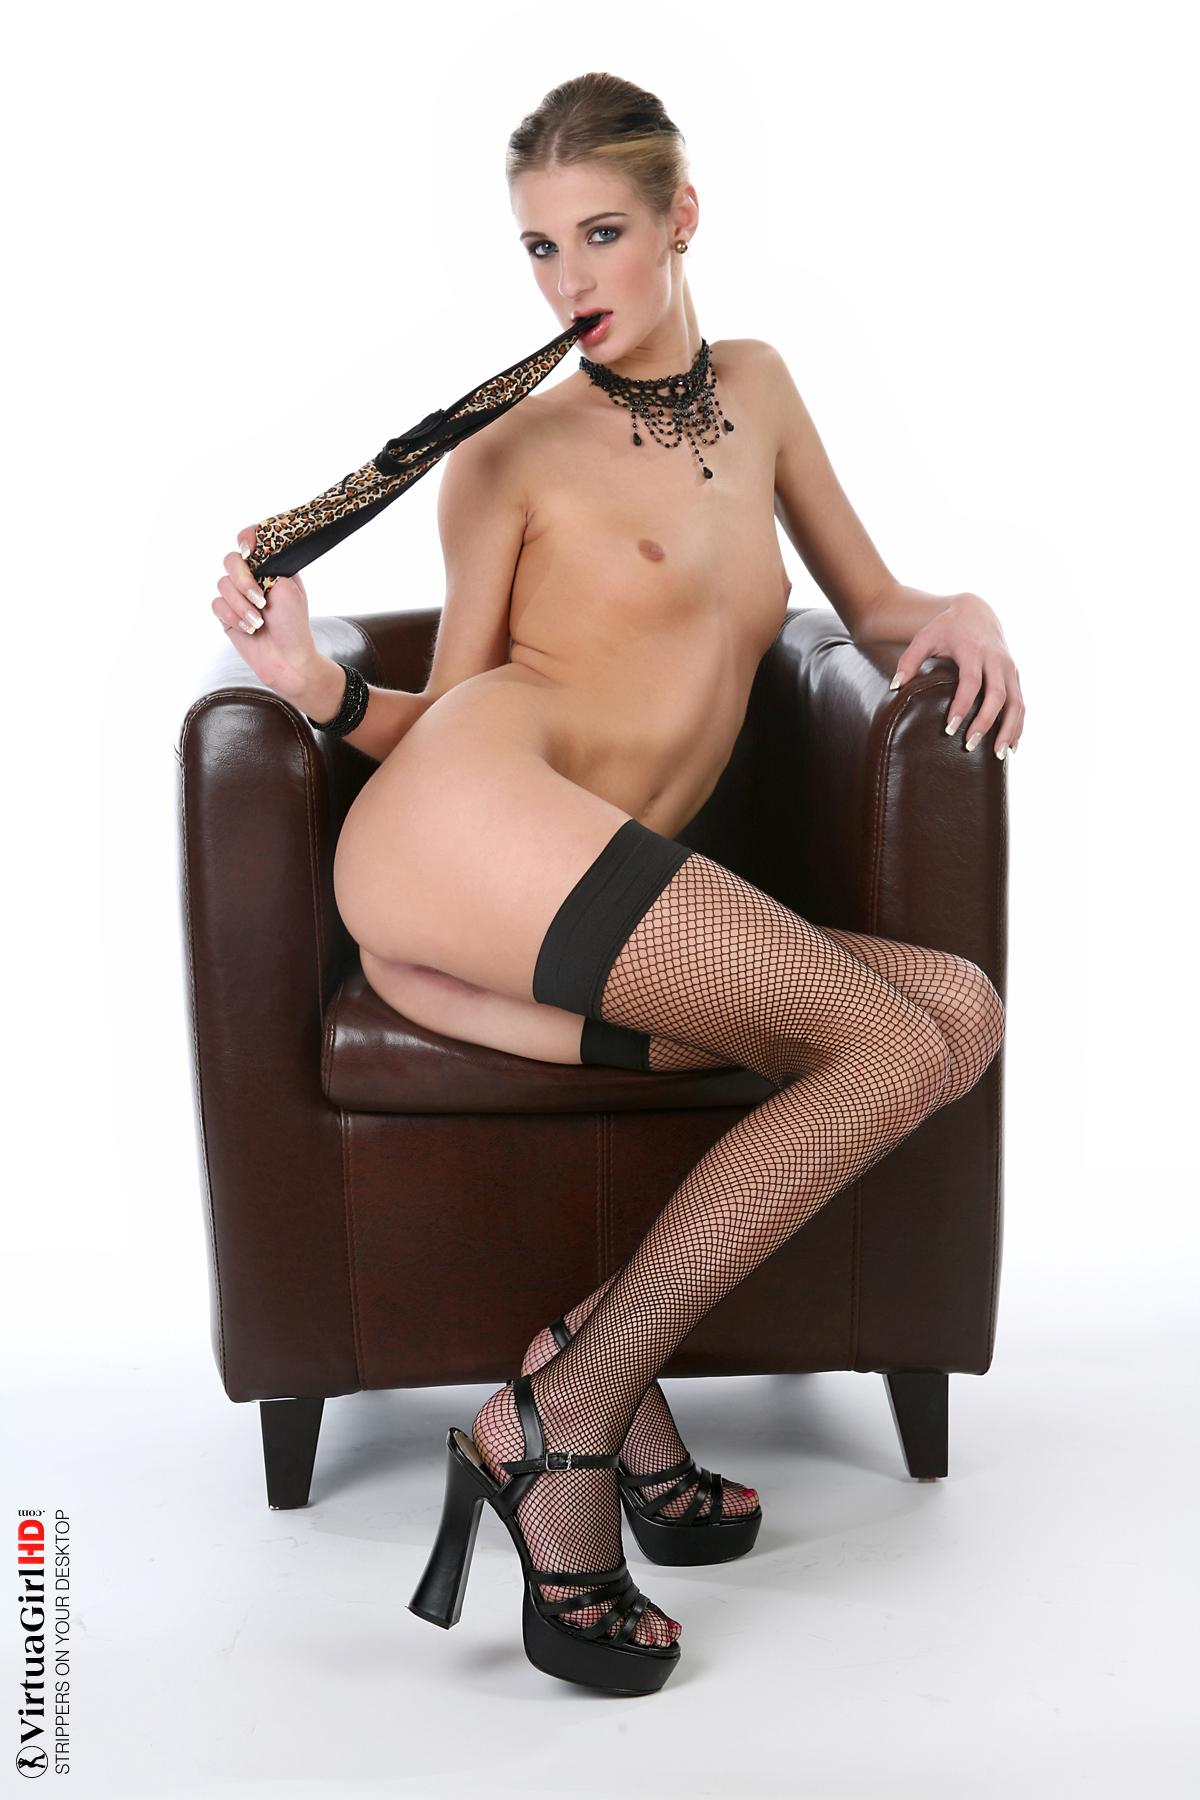 vinesauce joel desktop stripper